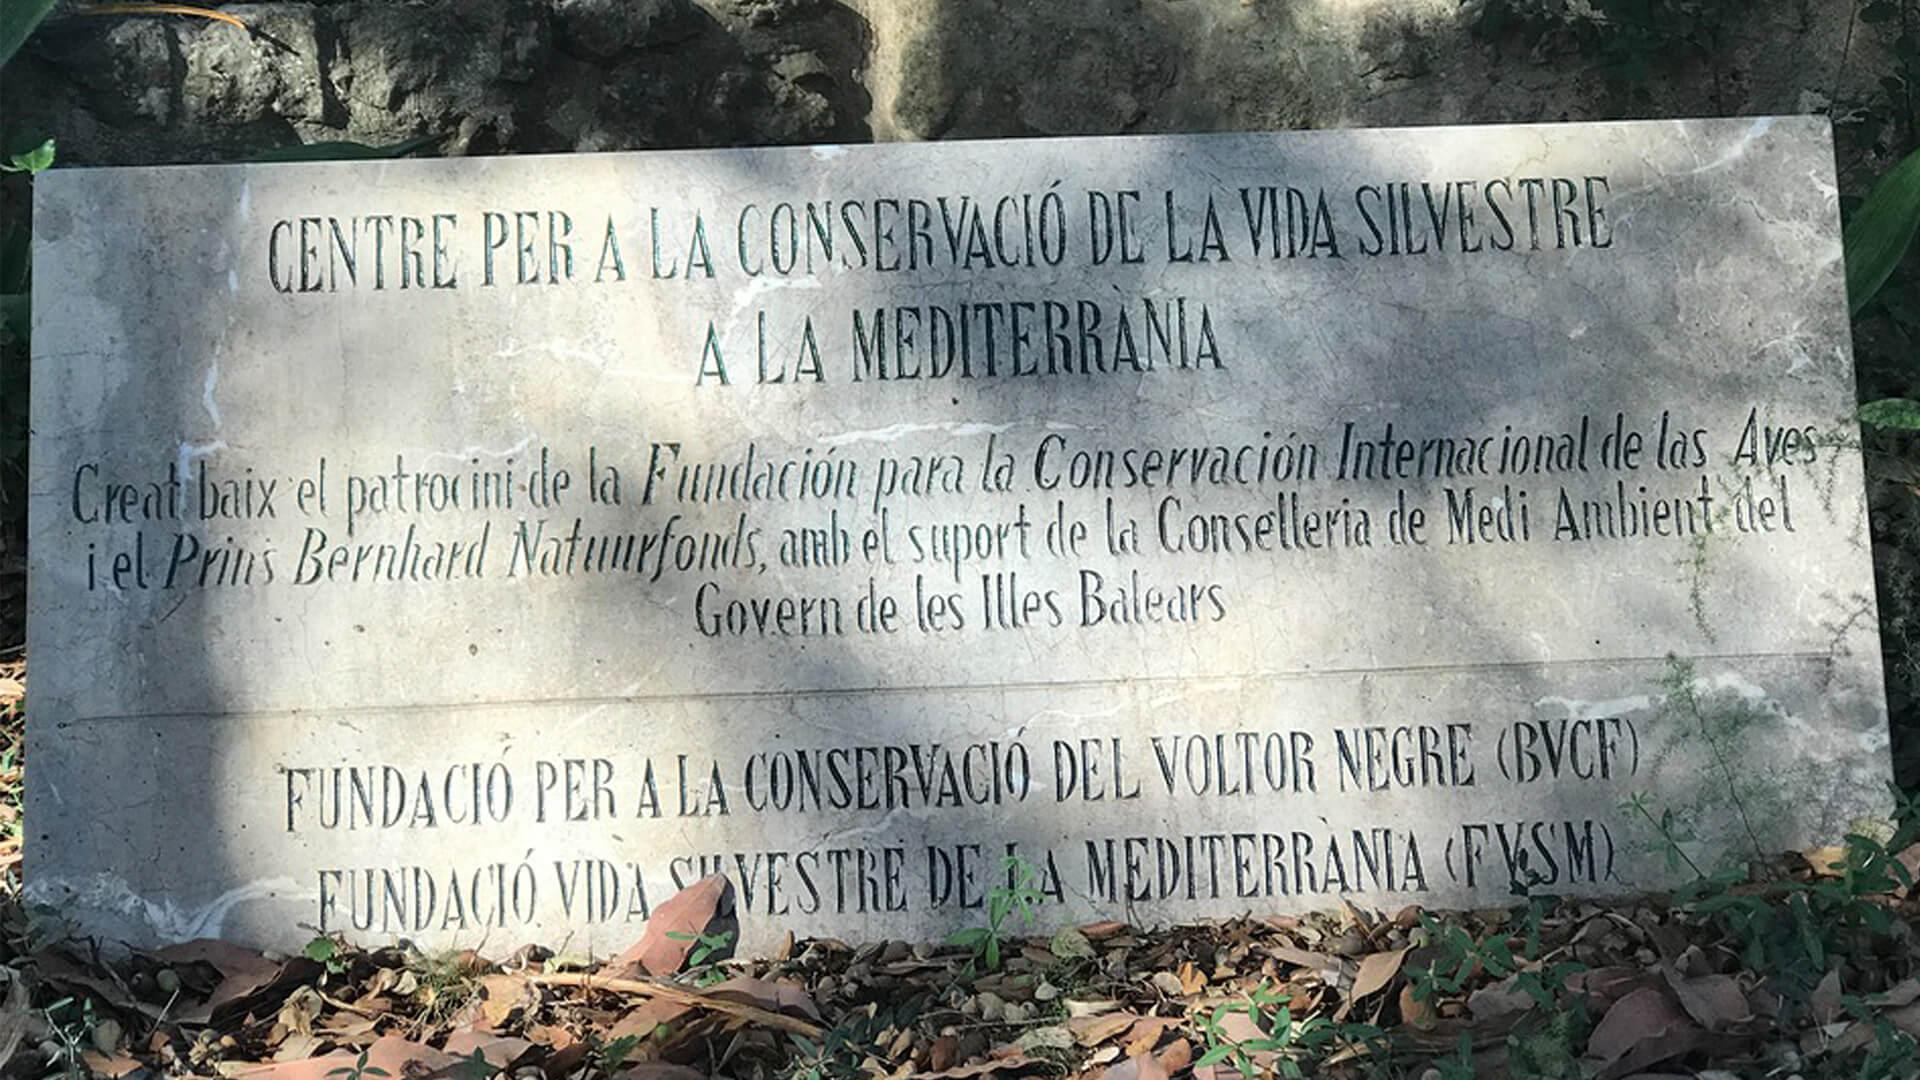 Vulure sanctuary mallorca sign